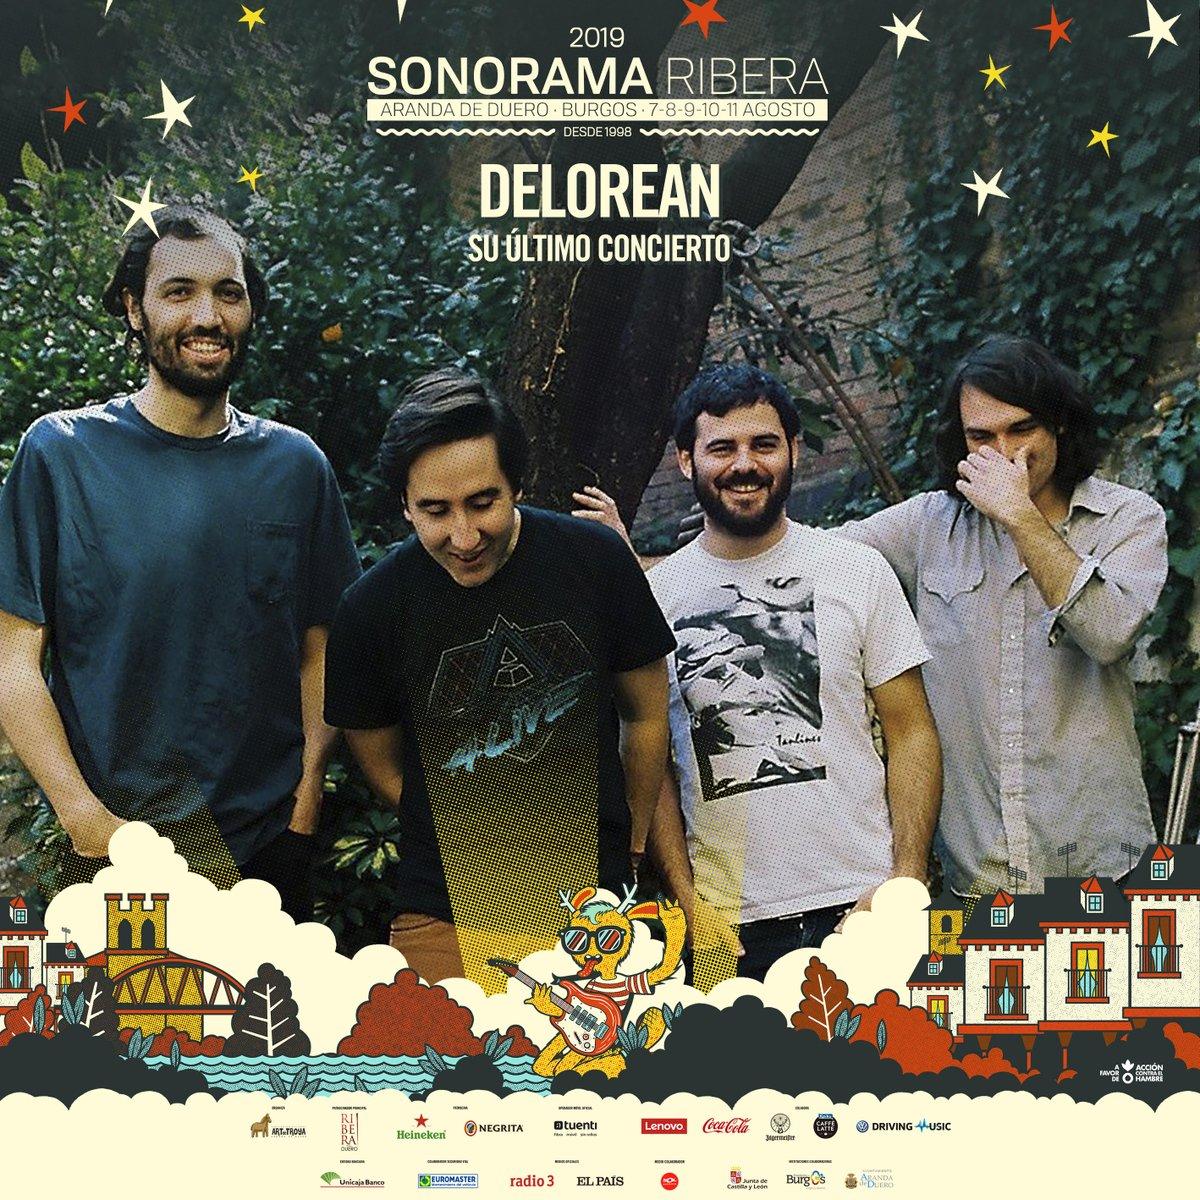 Sonorama 2019 - Página 18 D7UvGNvWwAU5jQf